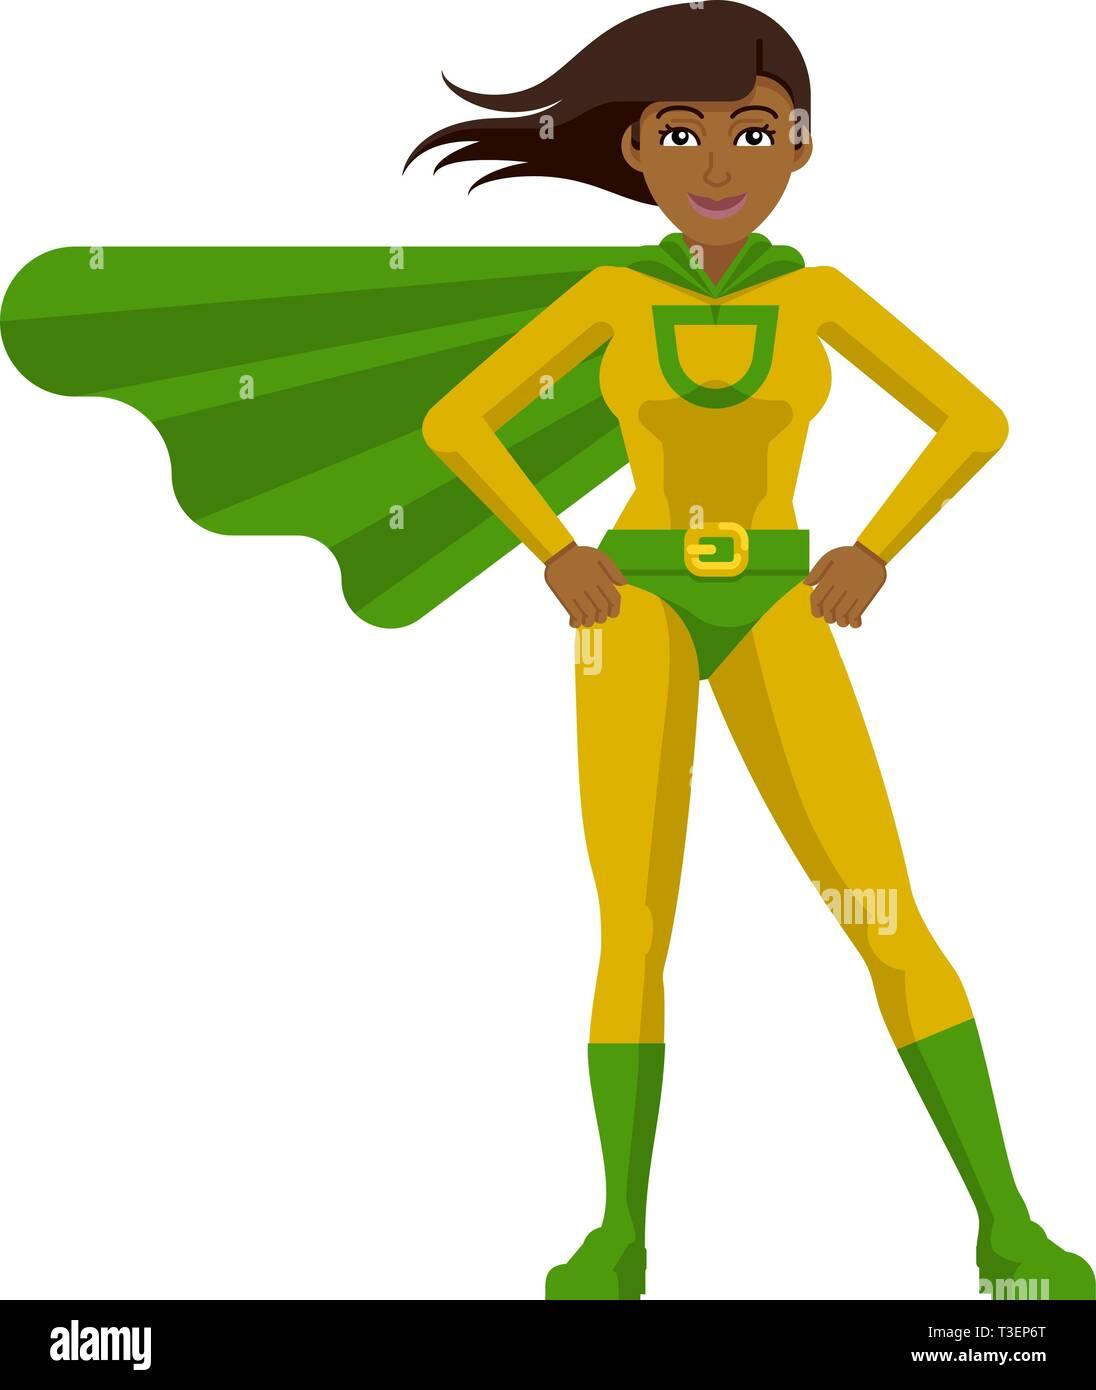 Asian Super Hero Woman Cartoon Stock Vector Image Art Alamy